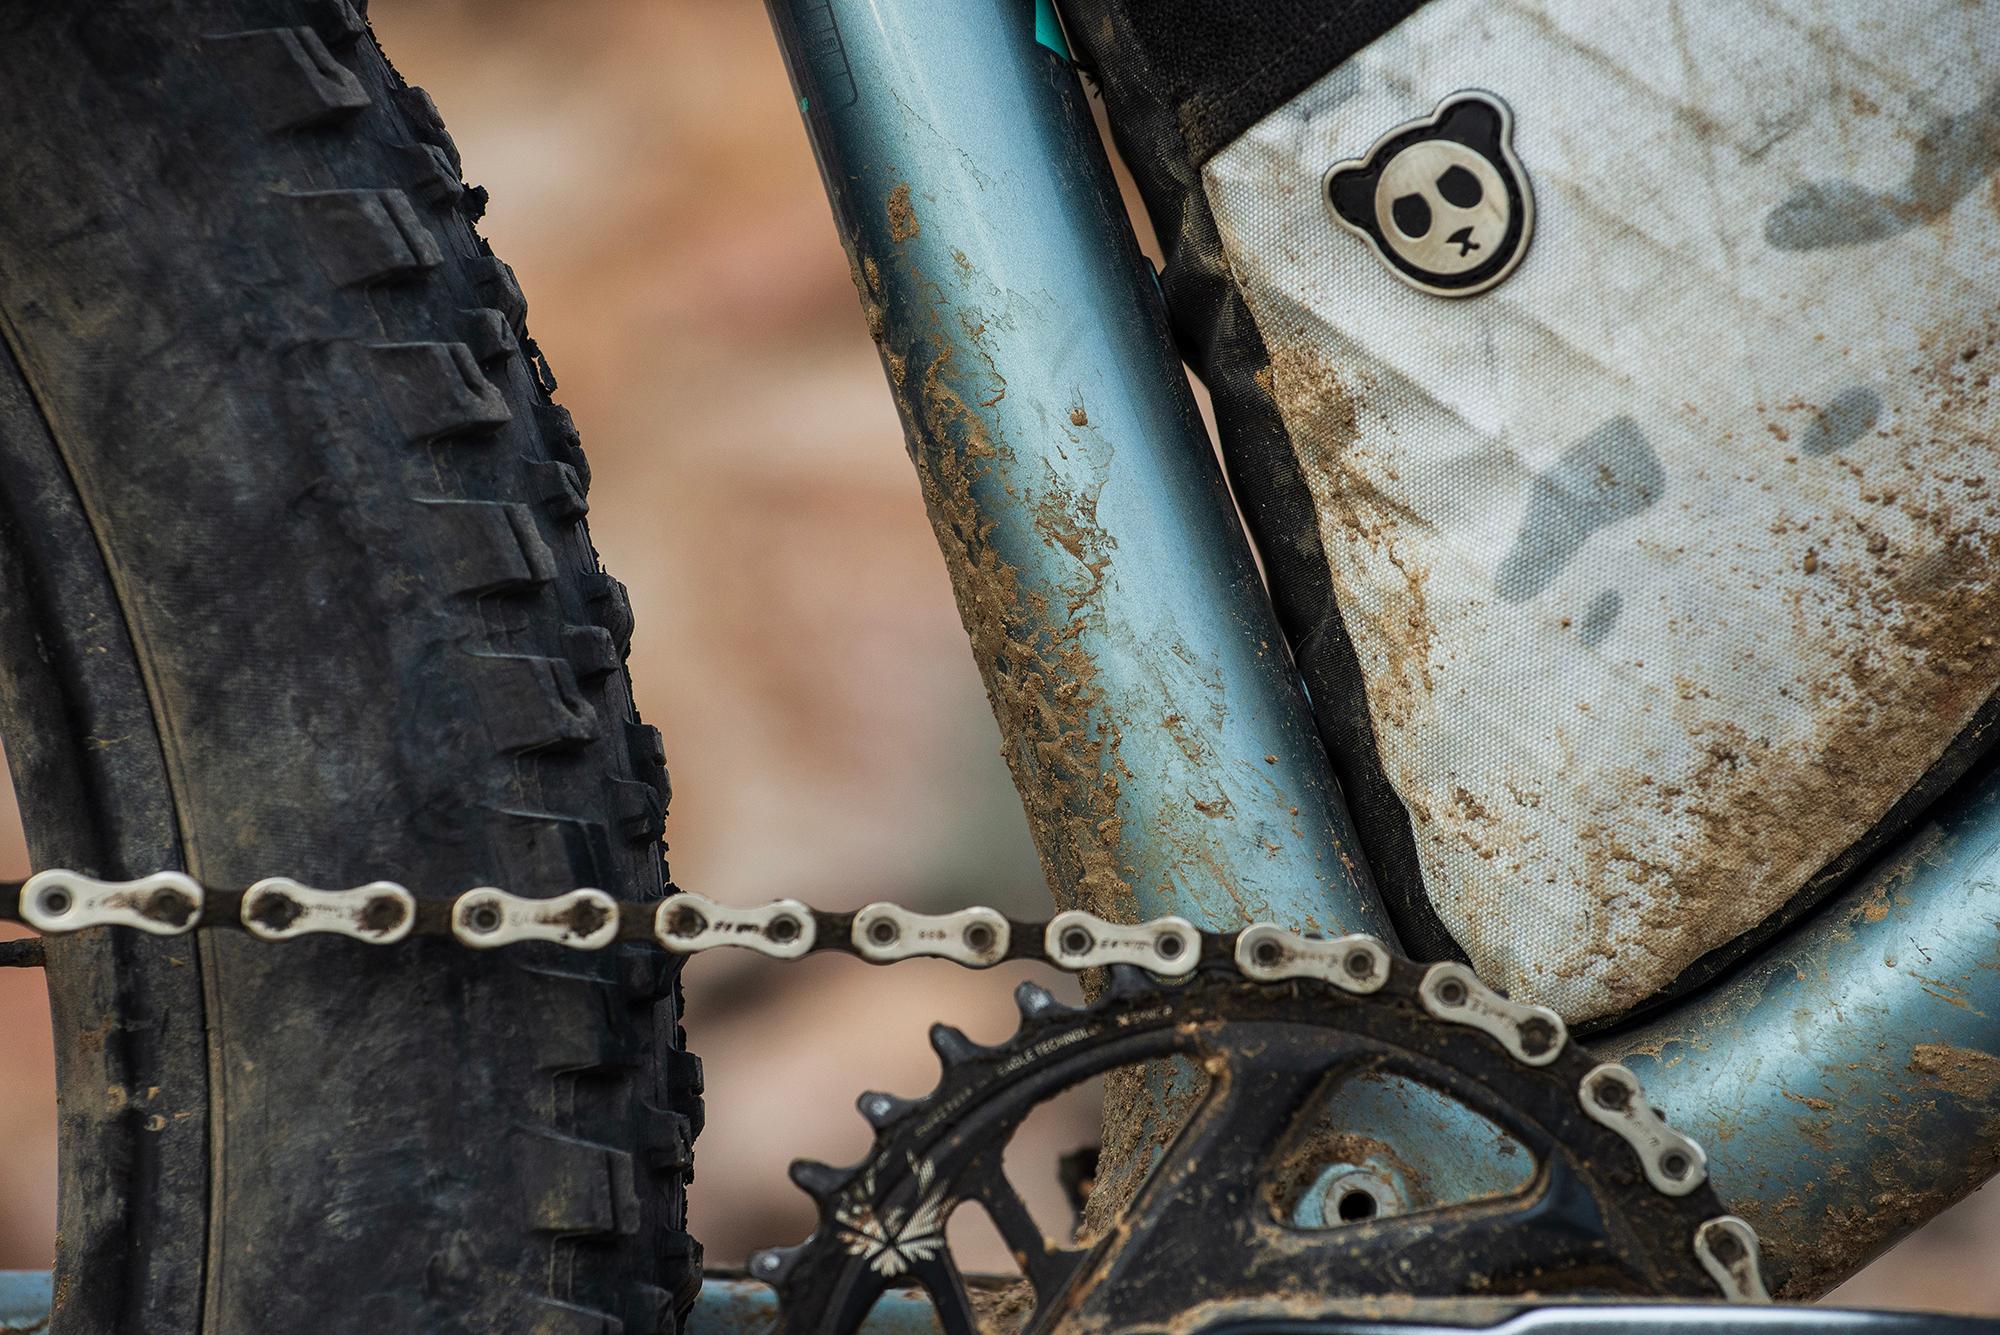 Kona Big Honzo CR/DL Carbon: Good Hardtails will Never Die